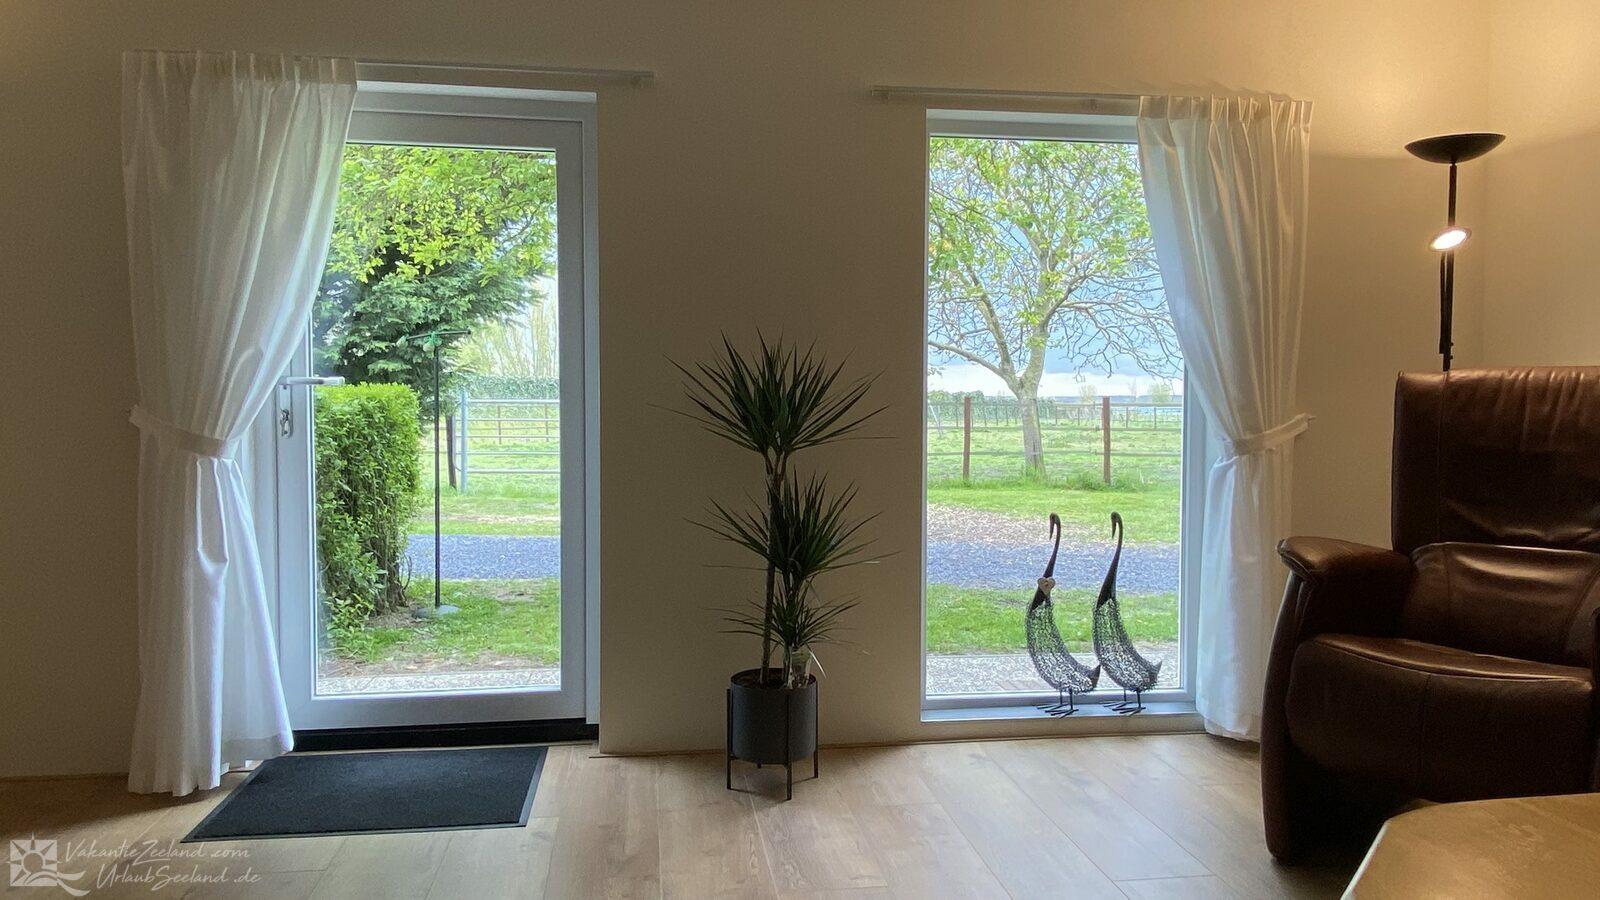 VZ997 Appartement in Aardenburg